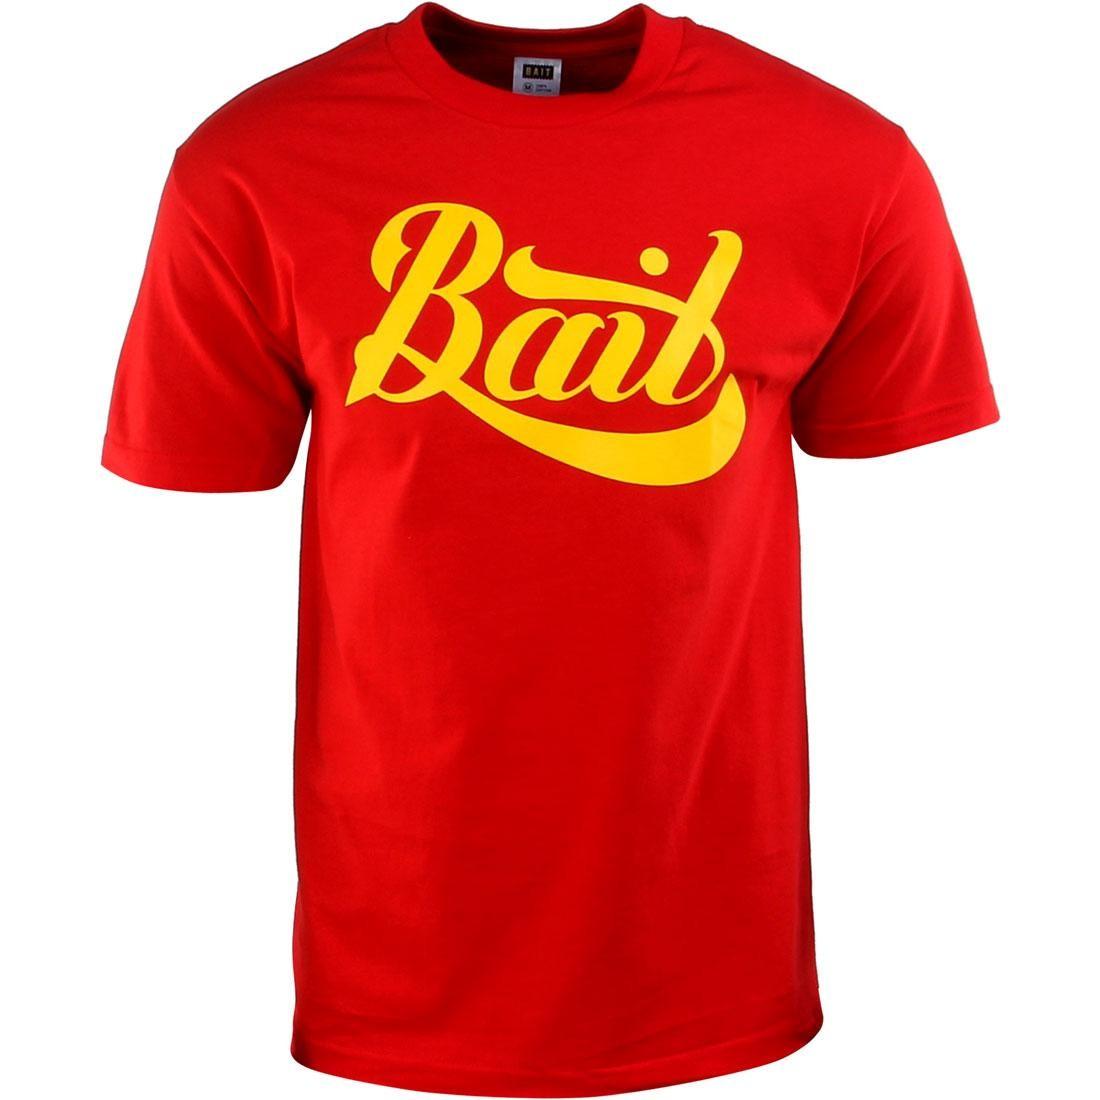 BAIT Script Logo Tee (red / yellow)